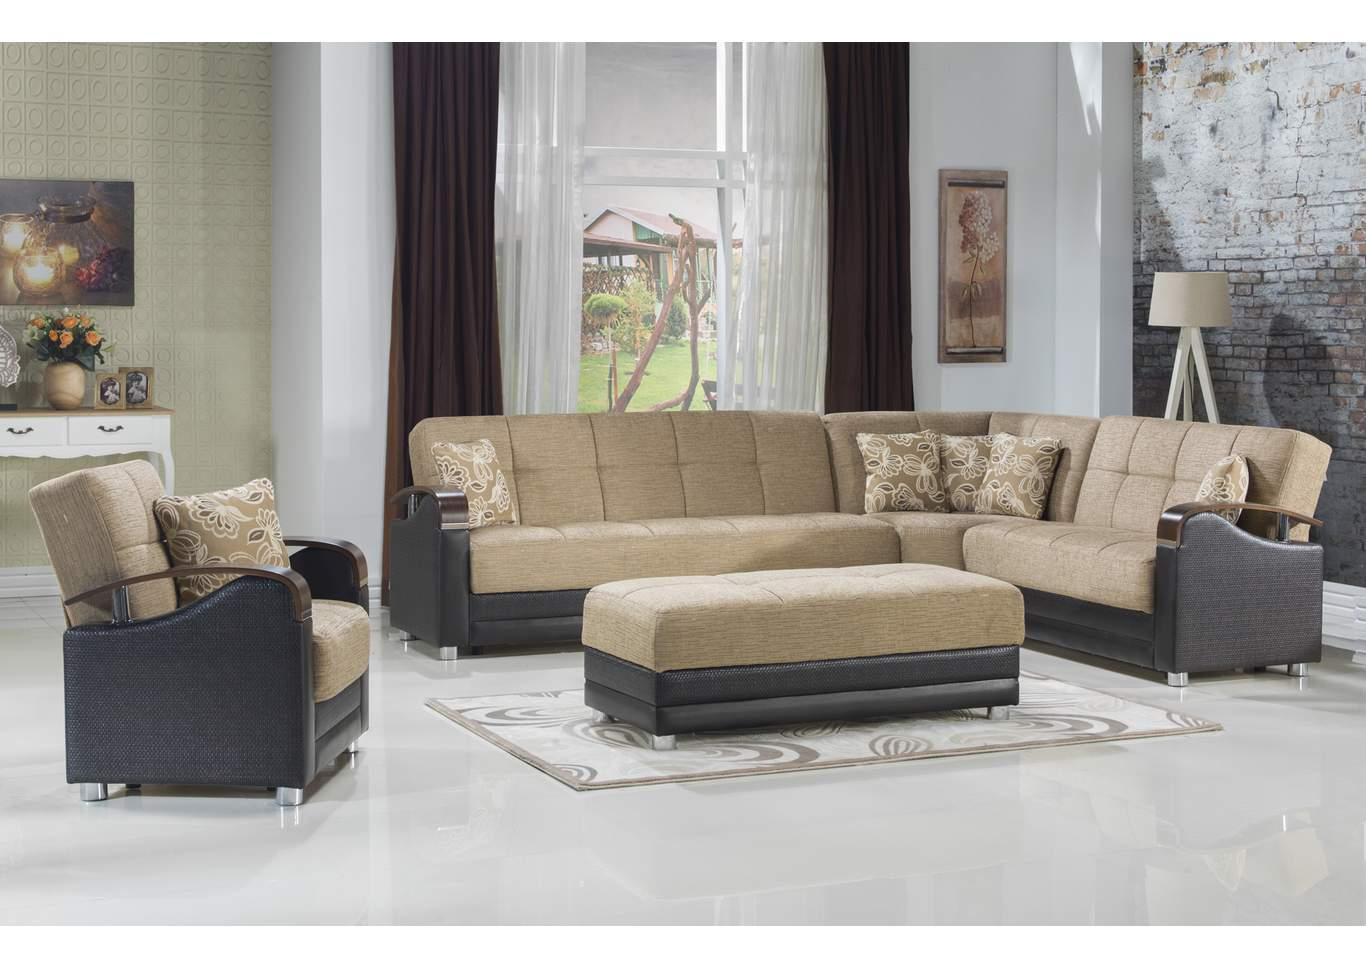 Best Buy Furniture and Mattress Luna Kose Takimi LAF Sofa ...